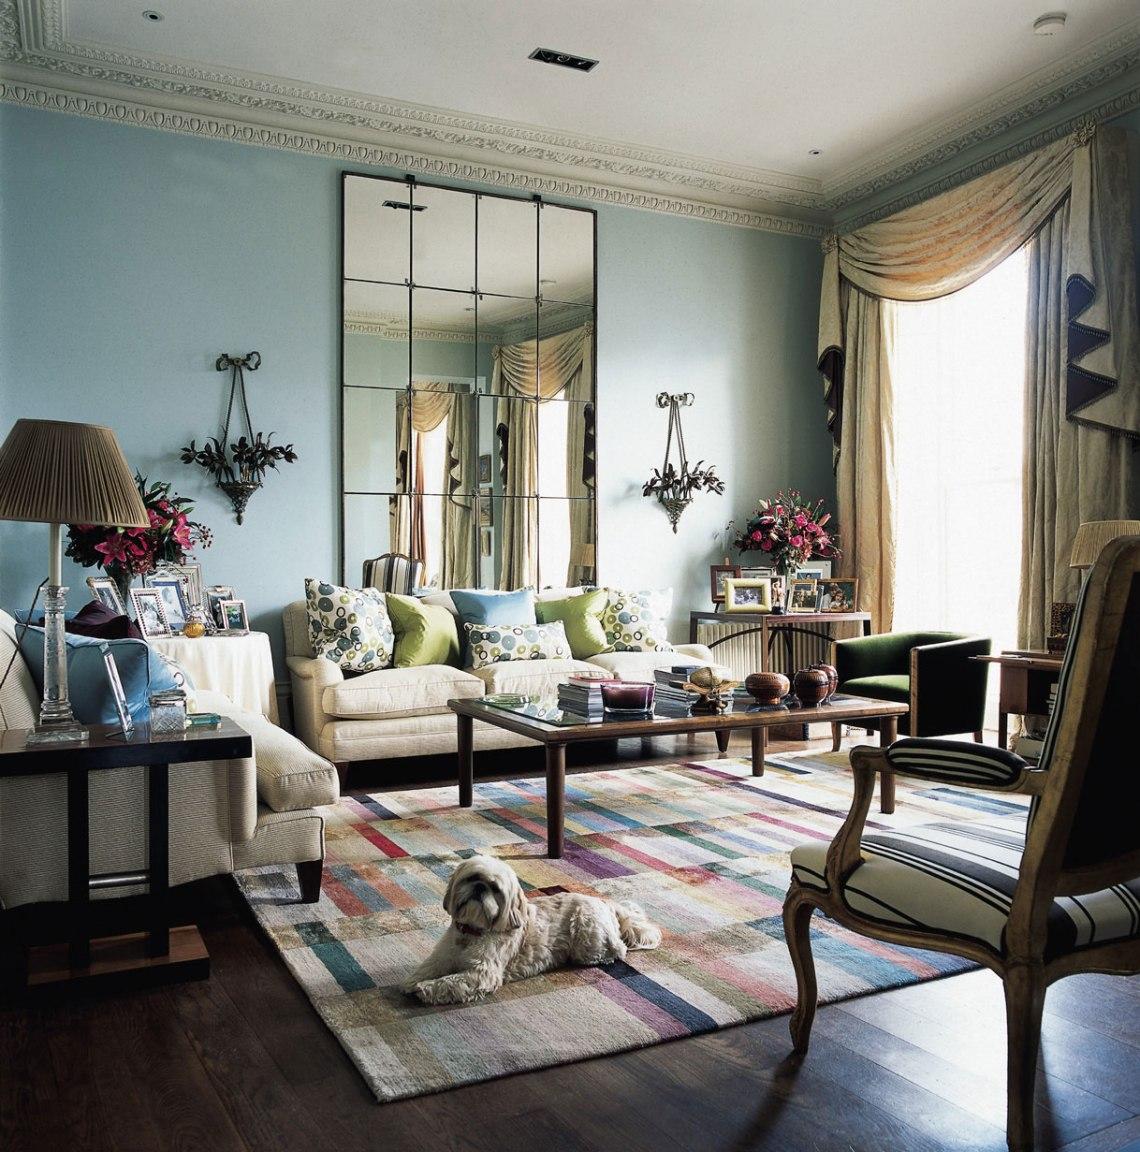 Rustic, Class, or Contemporary Interior Design: Design By ...